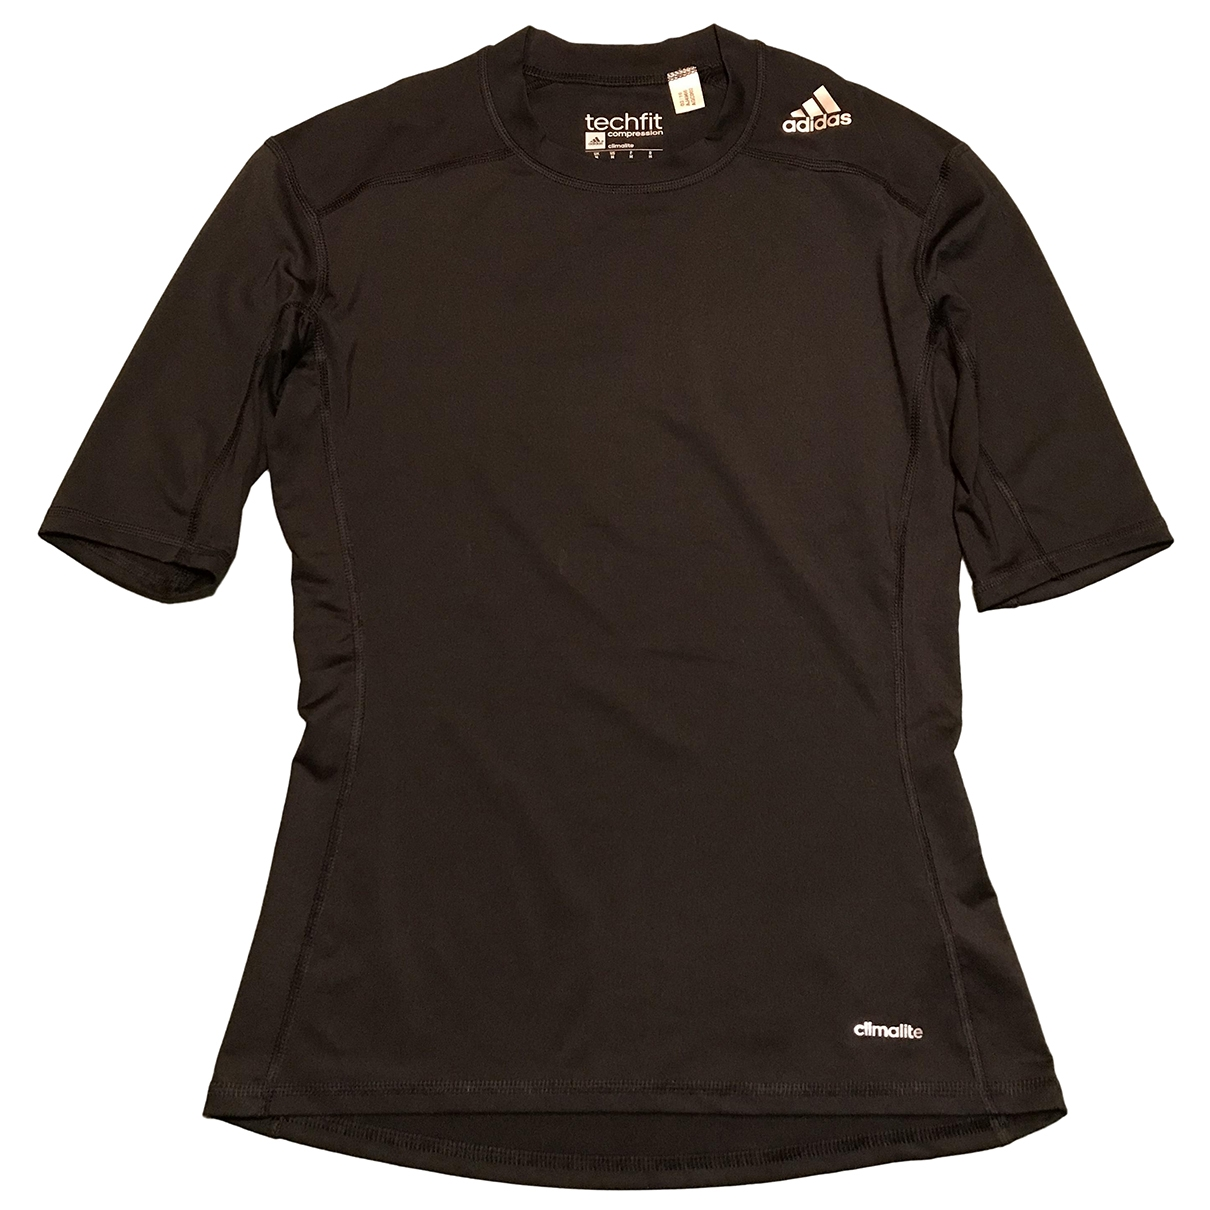 Adidas \N T-Shirts in  Schwarz Lycra